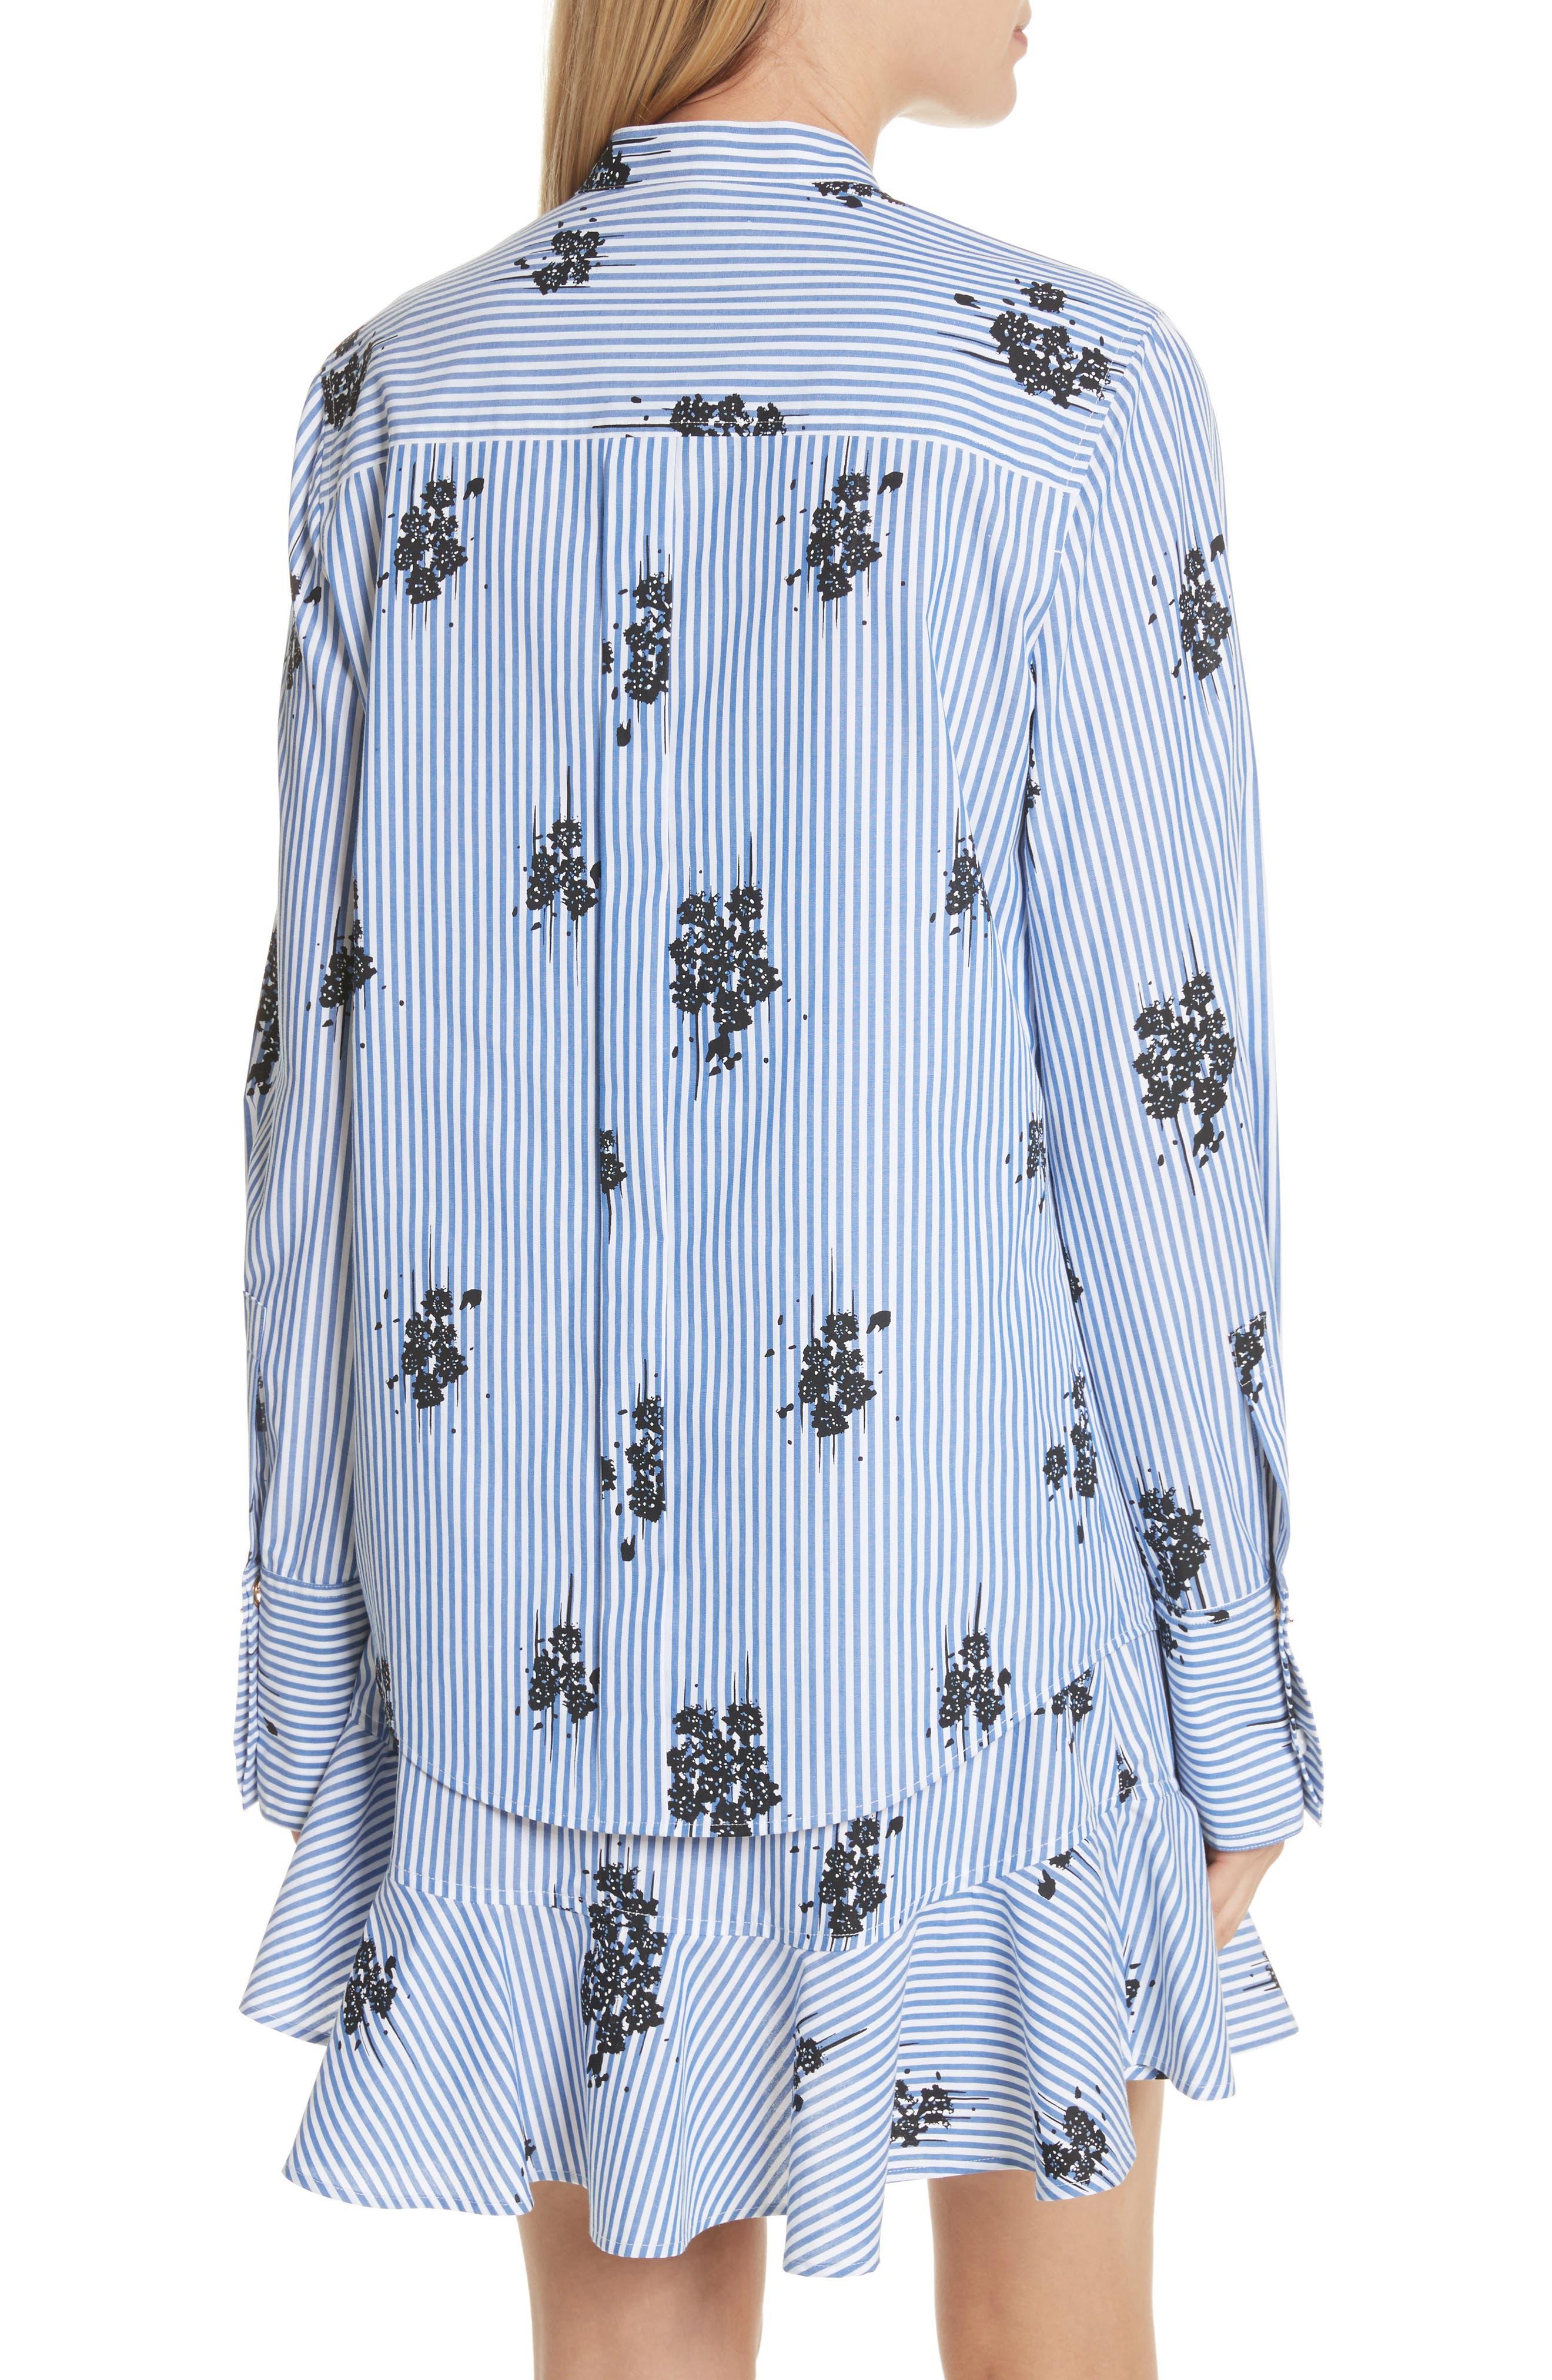 2-in-1 Ruffled Shirtdress,                             Alternate thumbnail 2, color,                             420